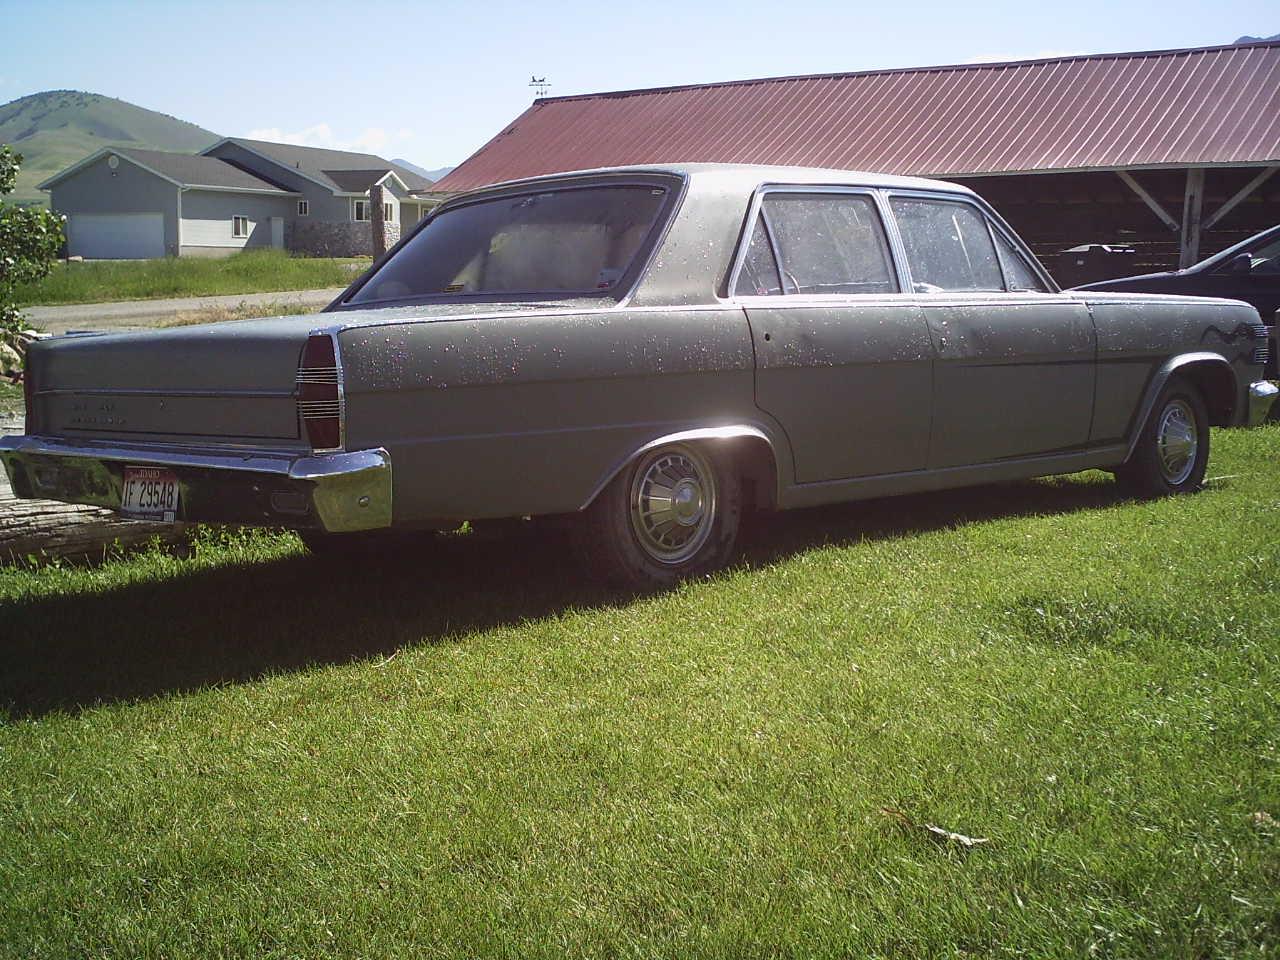 Click image for larger version  Name:jon's car 001.jpg Views:108 Size:191.8 KB ID:5687